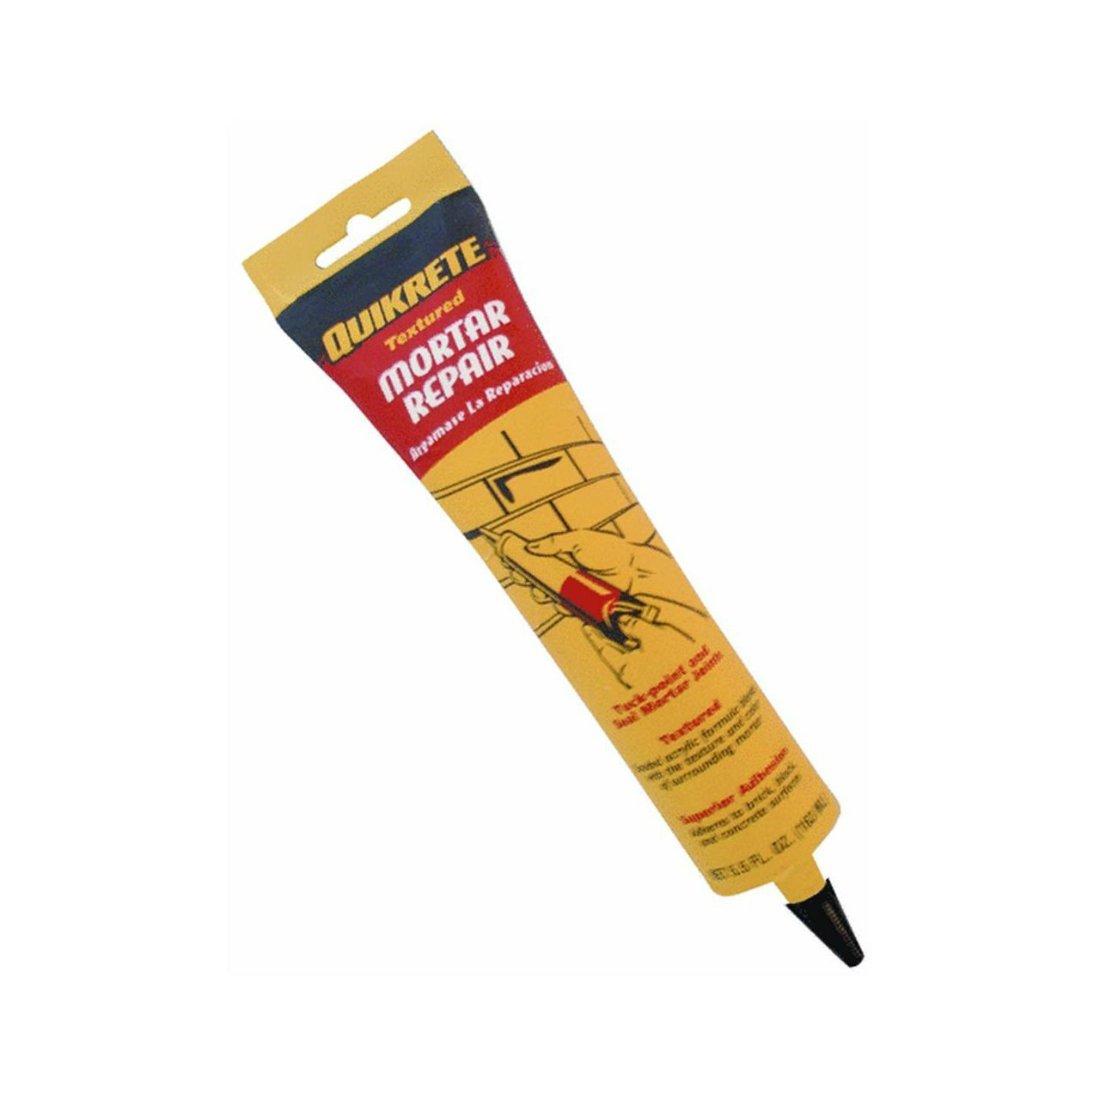 Quikrete 862009 Mortar Repair, 5.5 oz. Squeeze Tube Quikrete Co. 8620-05